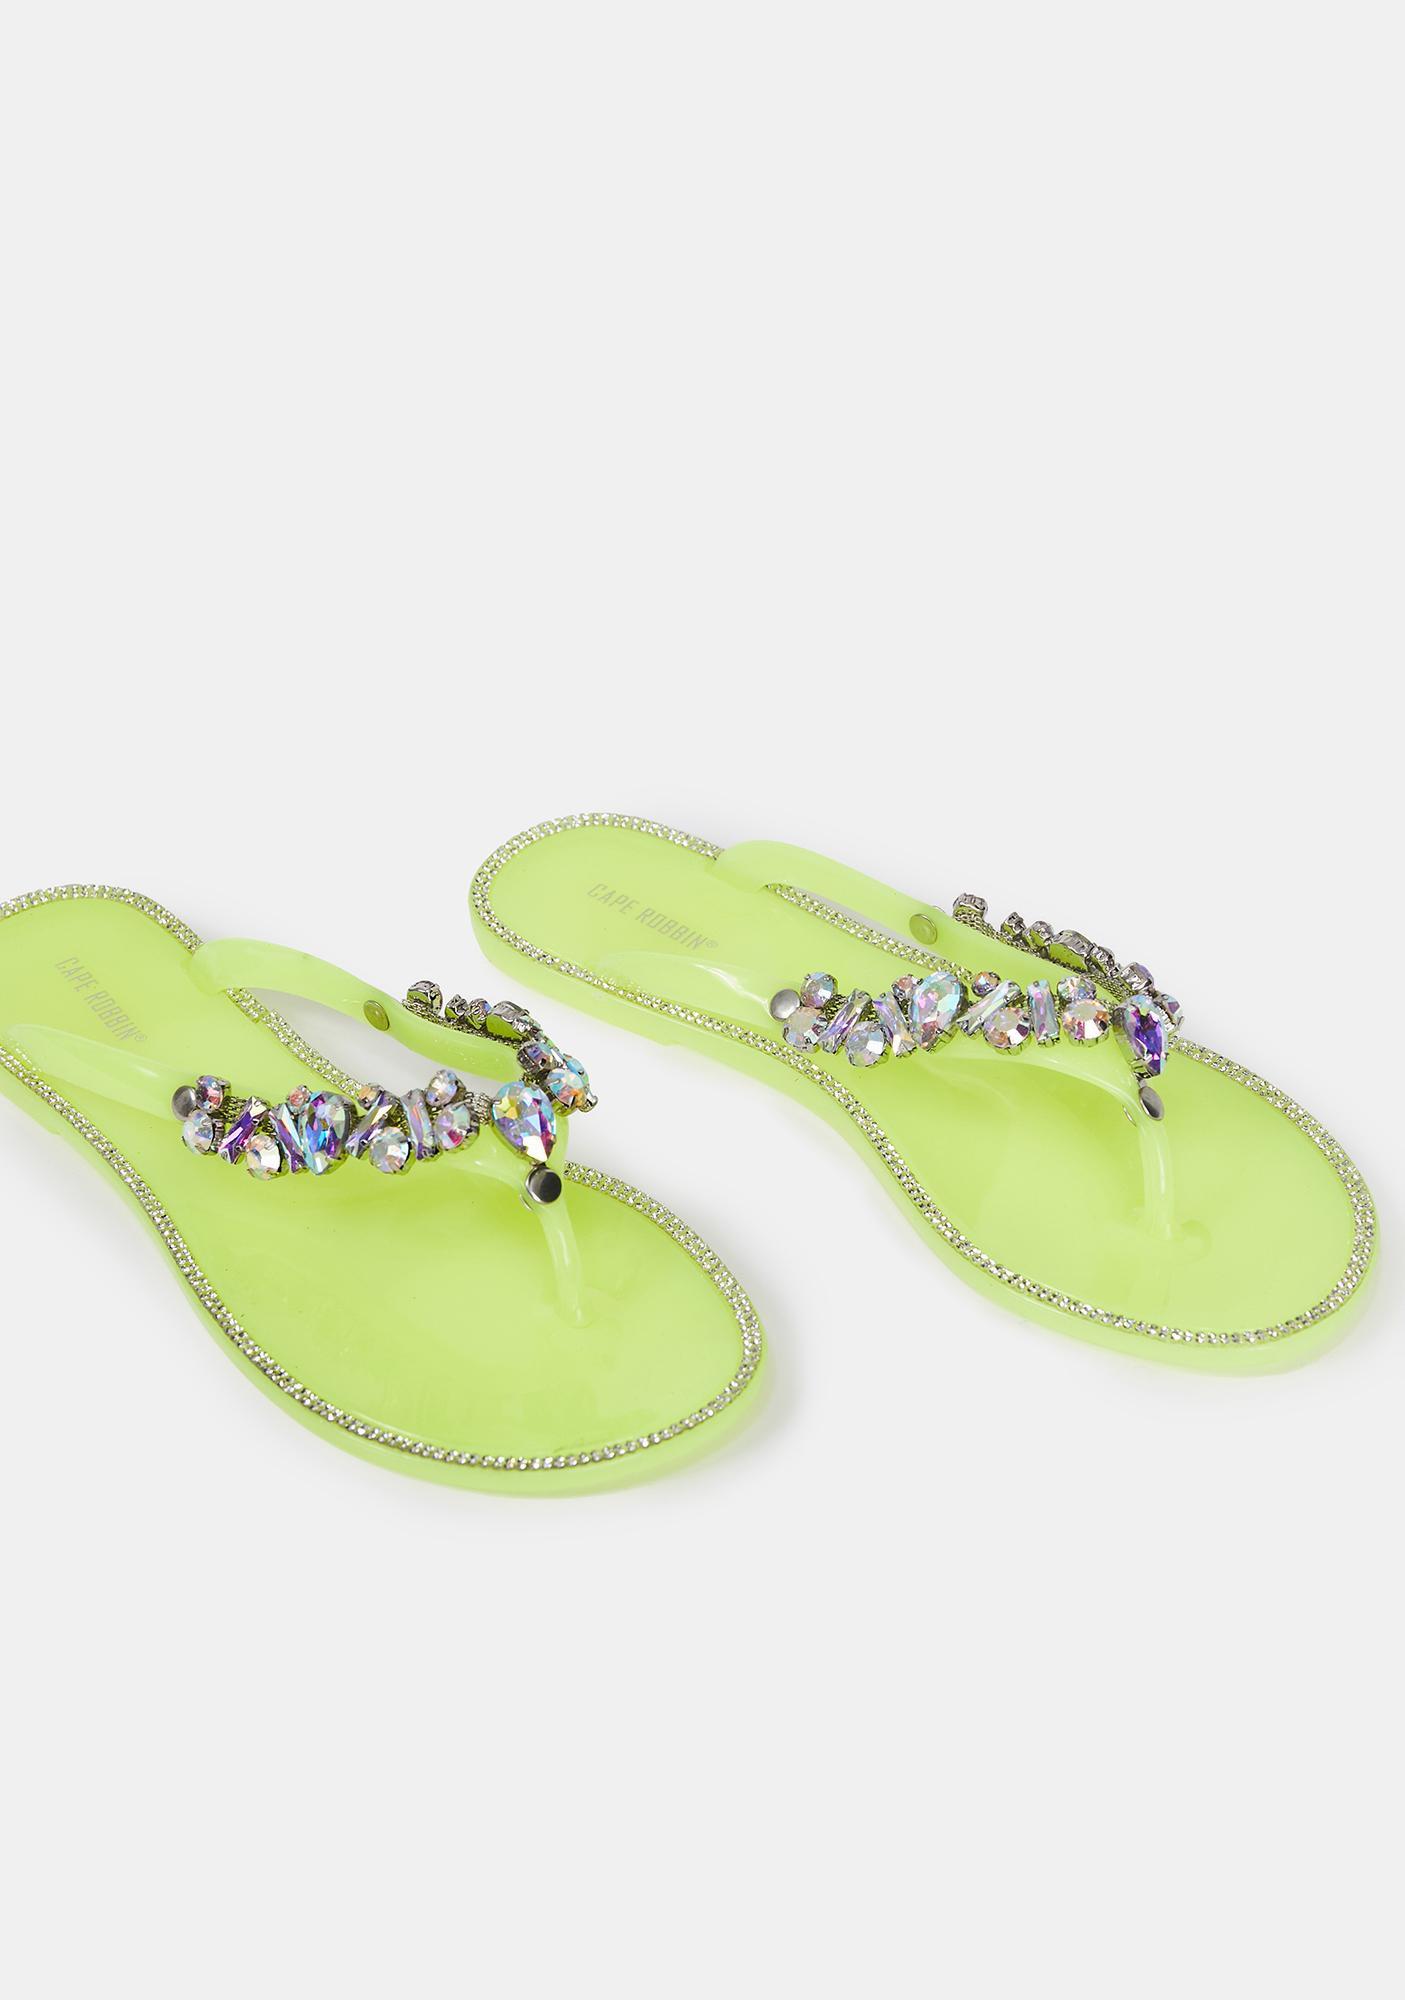 Cash Treasure Island Sandals